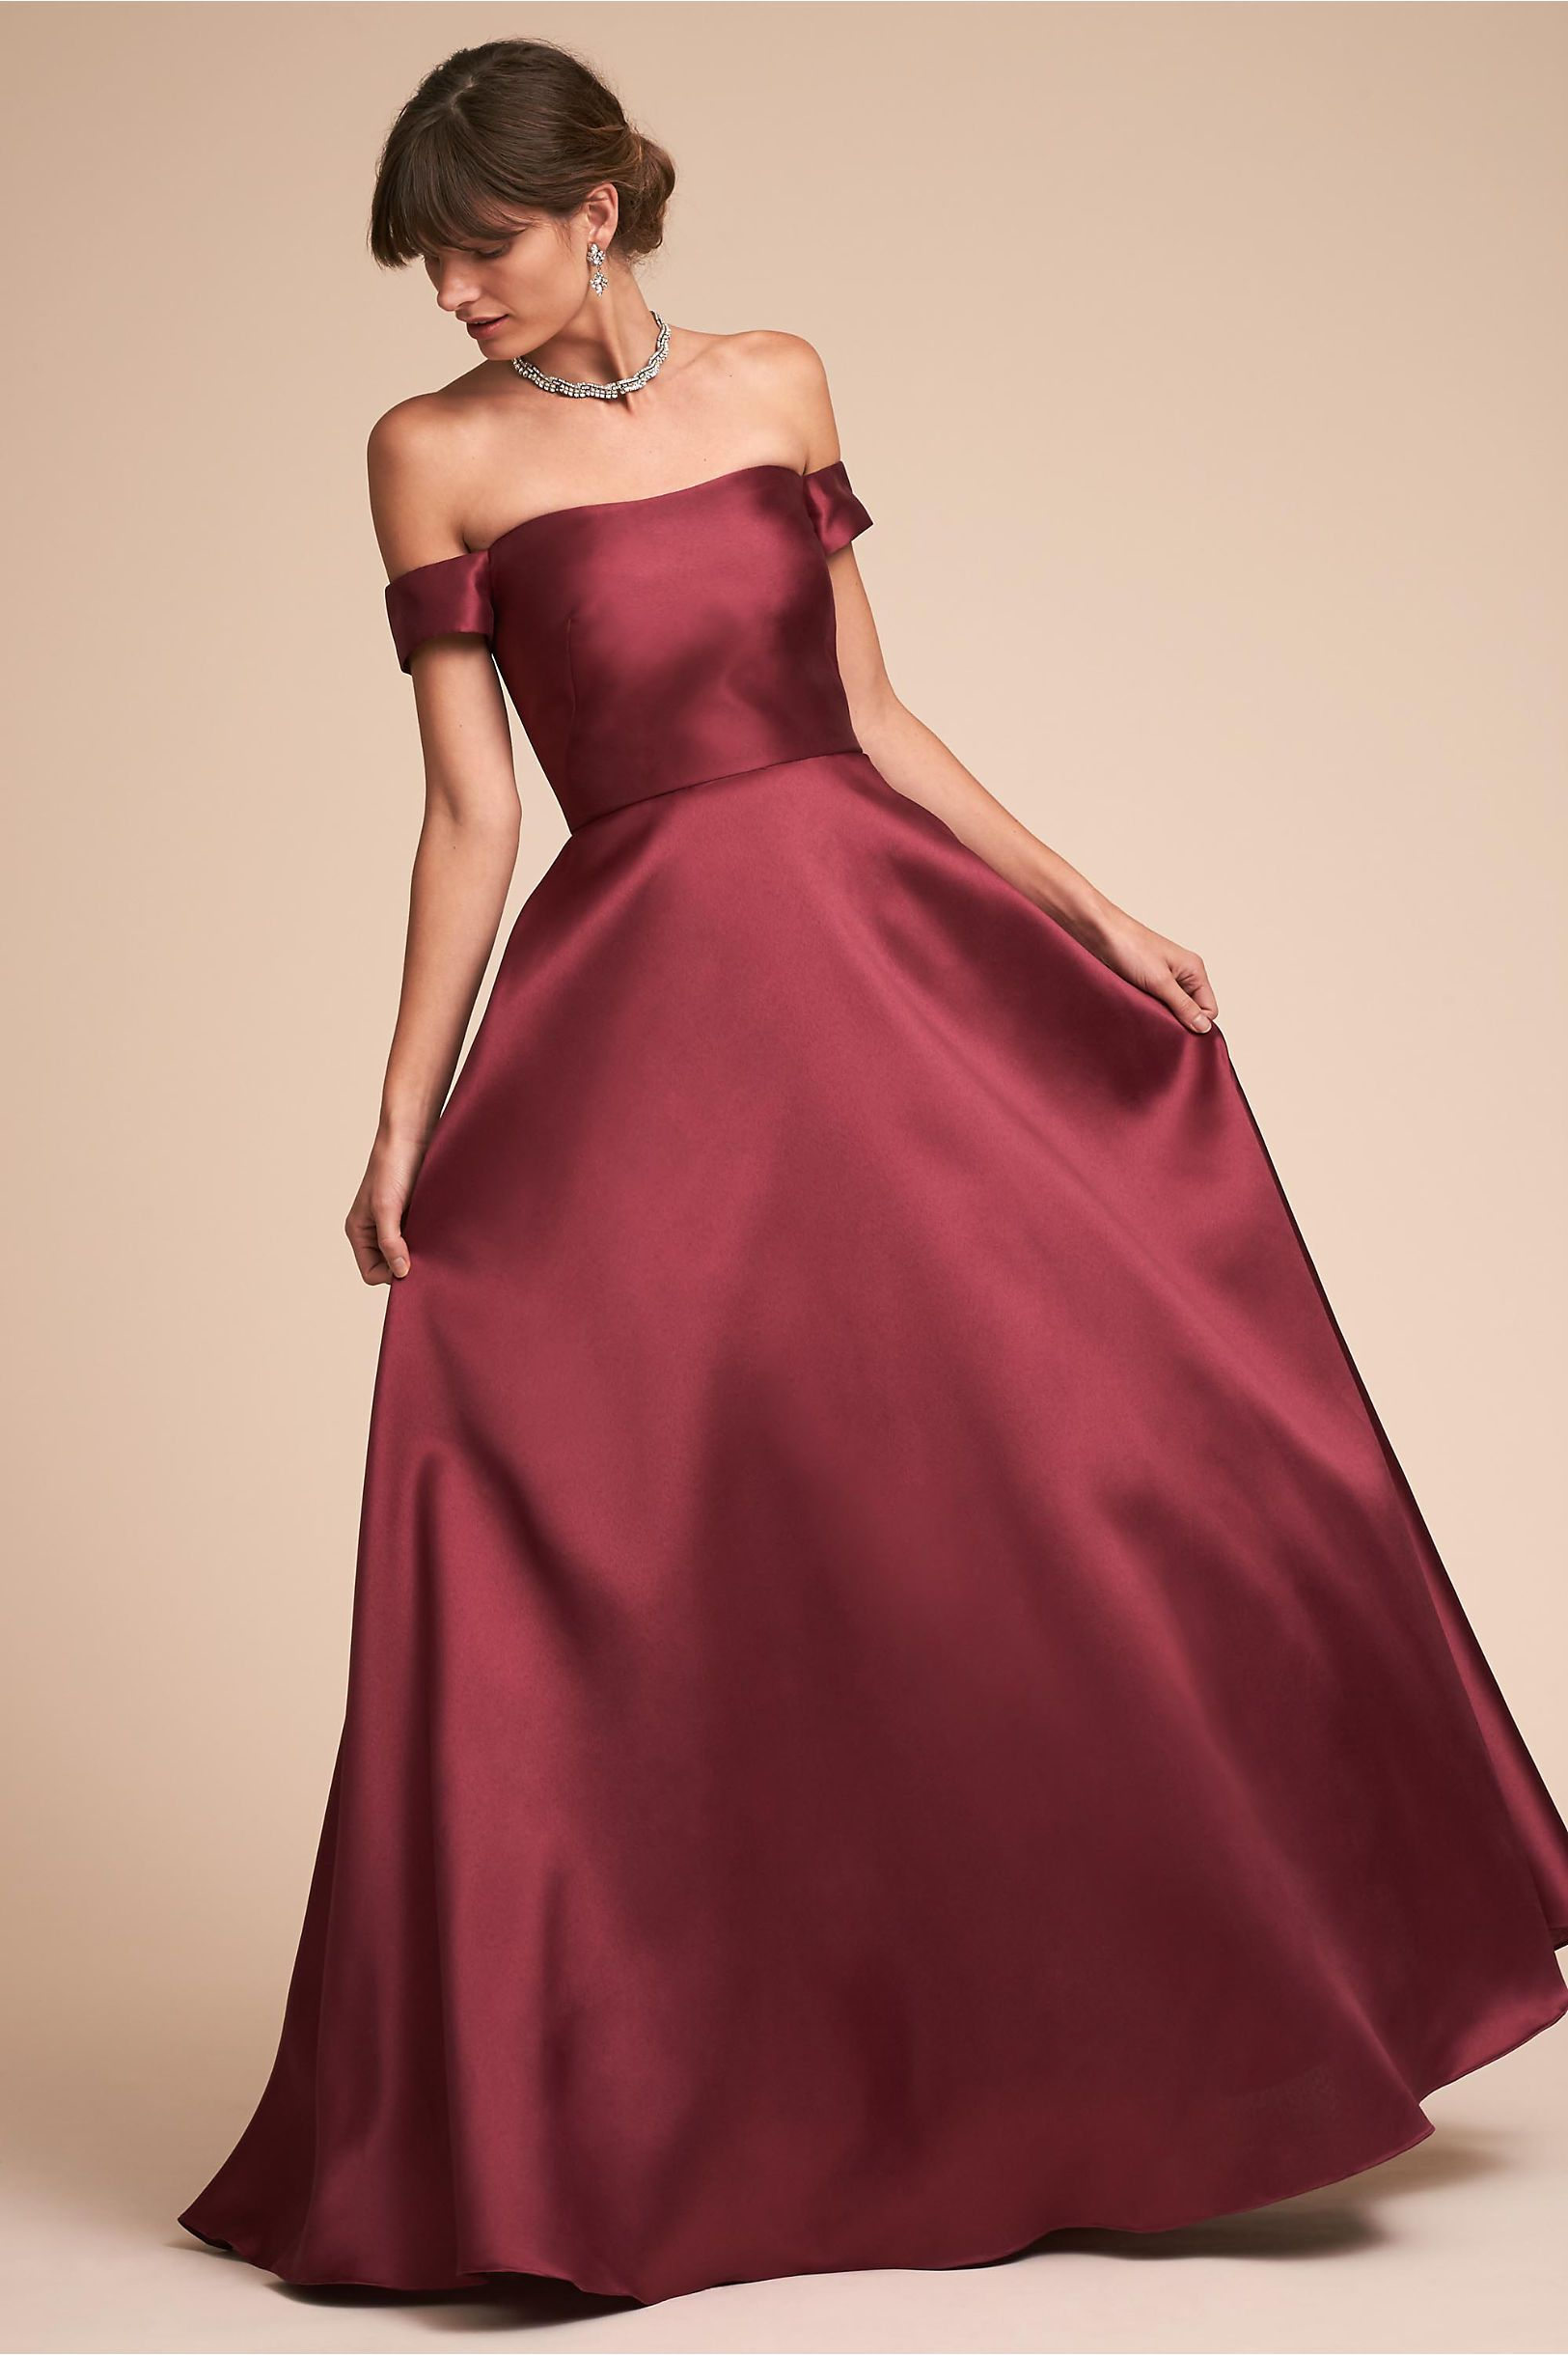 43f1969c4be3 BHLDN s Chatham Dress in Raspberry